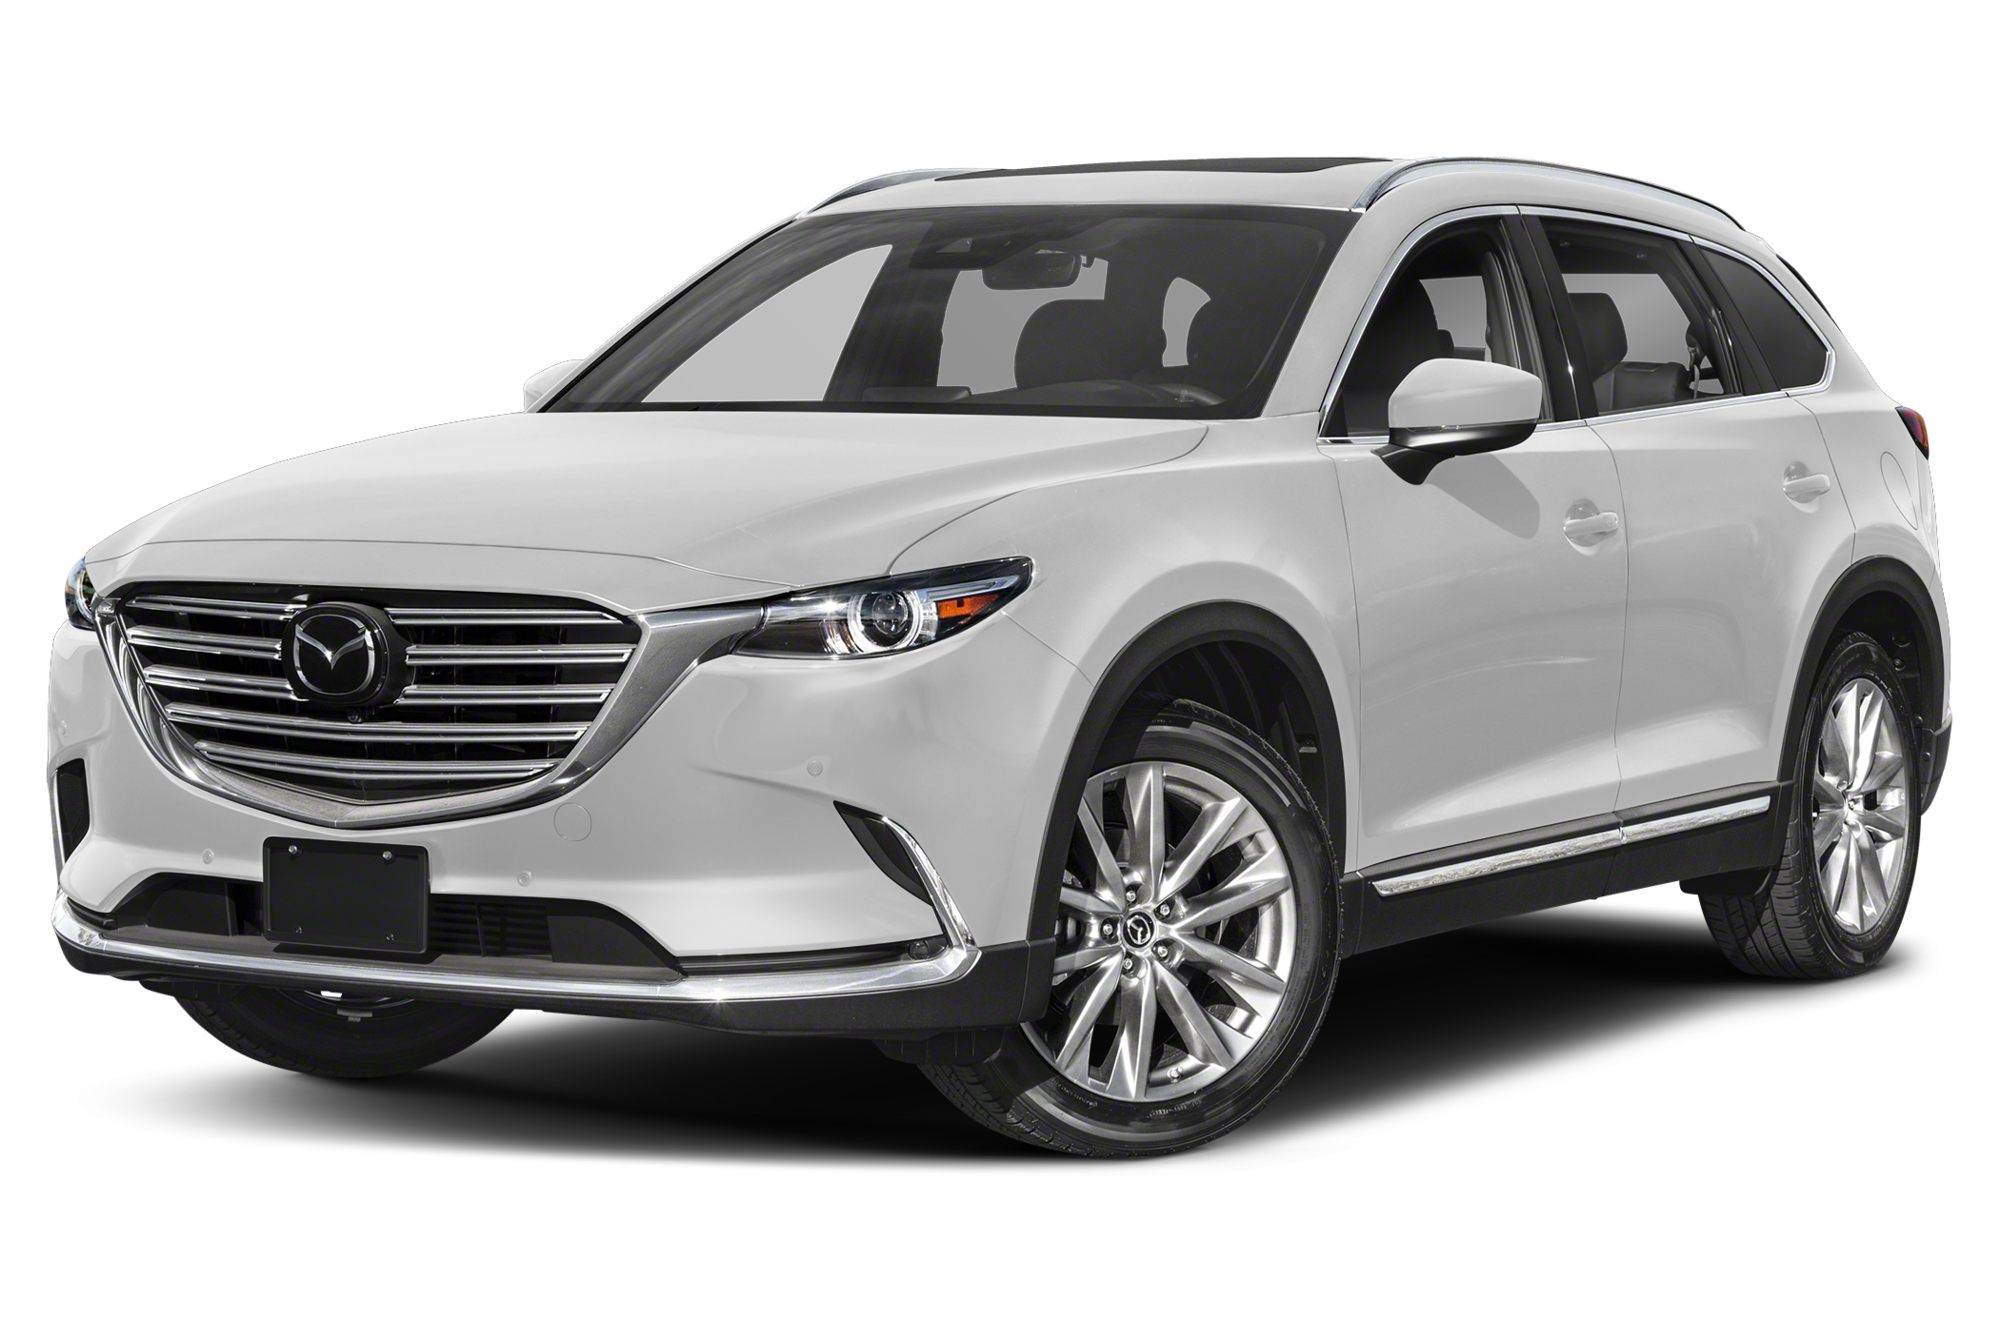 2019 Mazda CX-9: Recall Alert